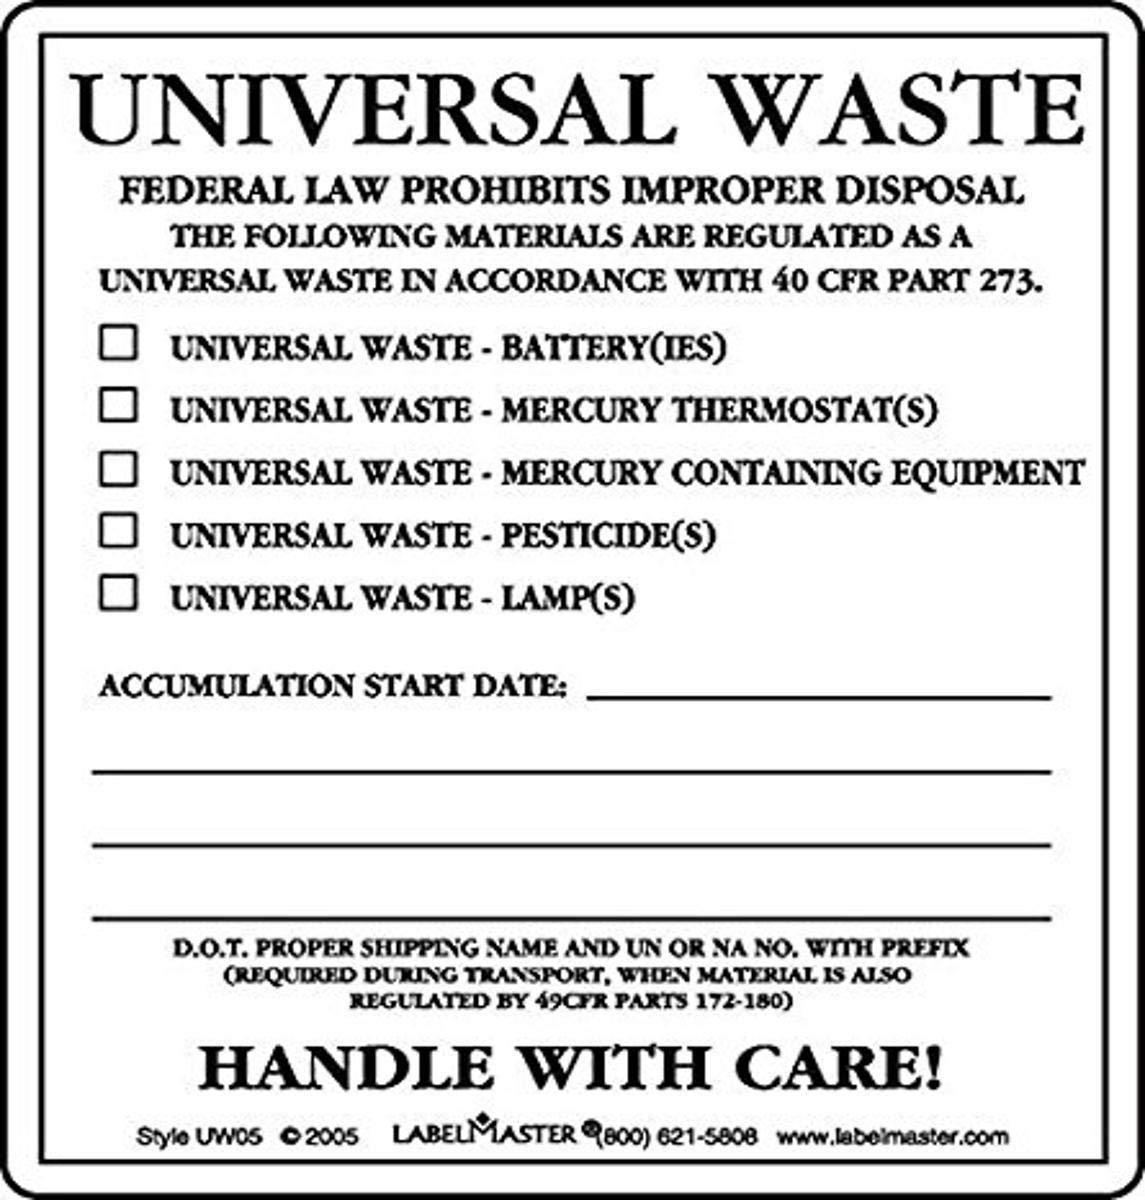 Labelmaster UW05 Universal Waste Label, PVC-Free Film Stock (Pac